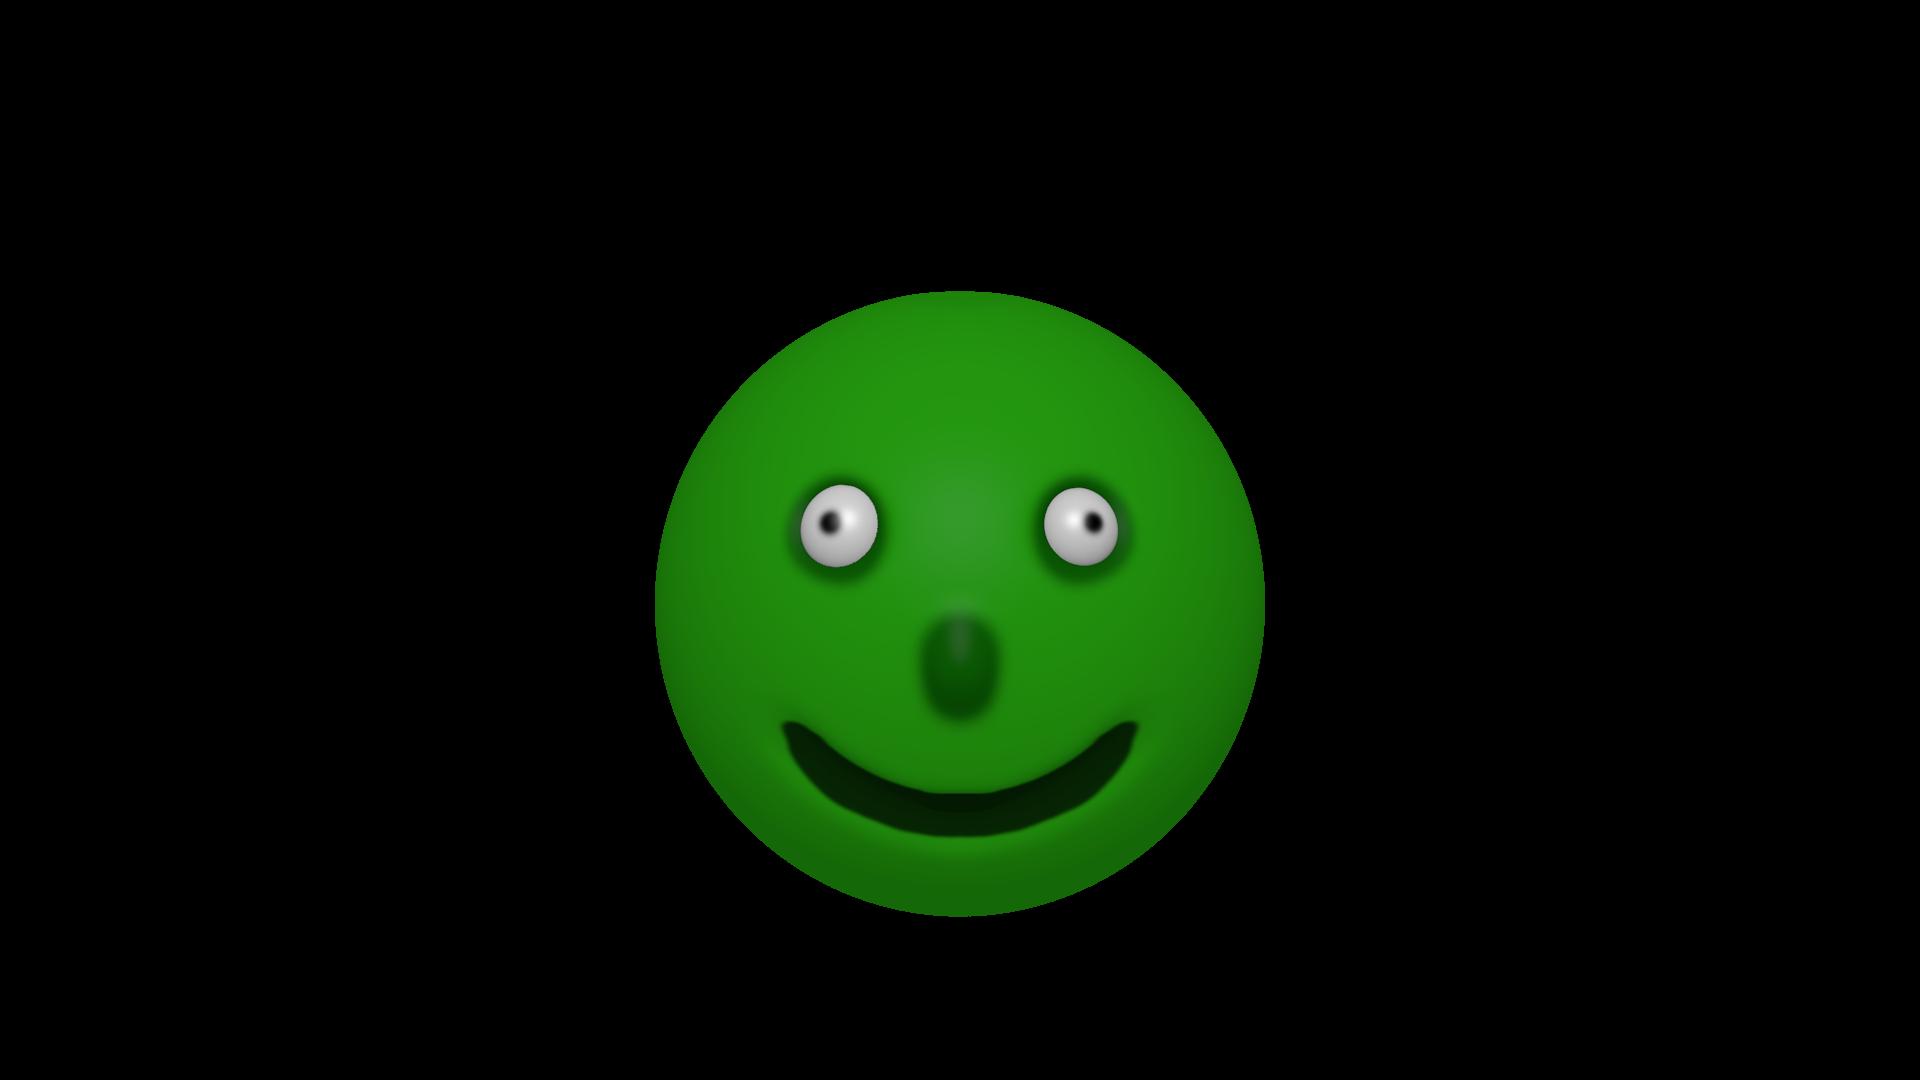 greenblobe